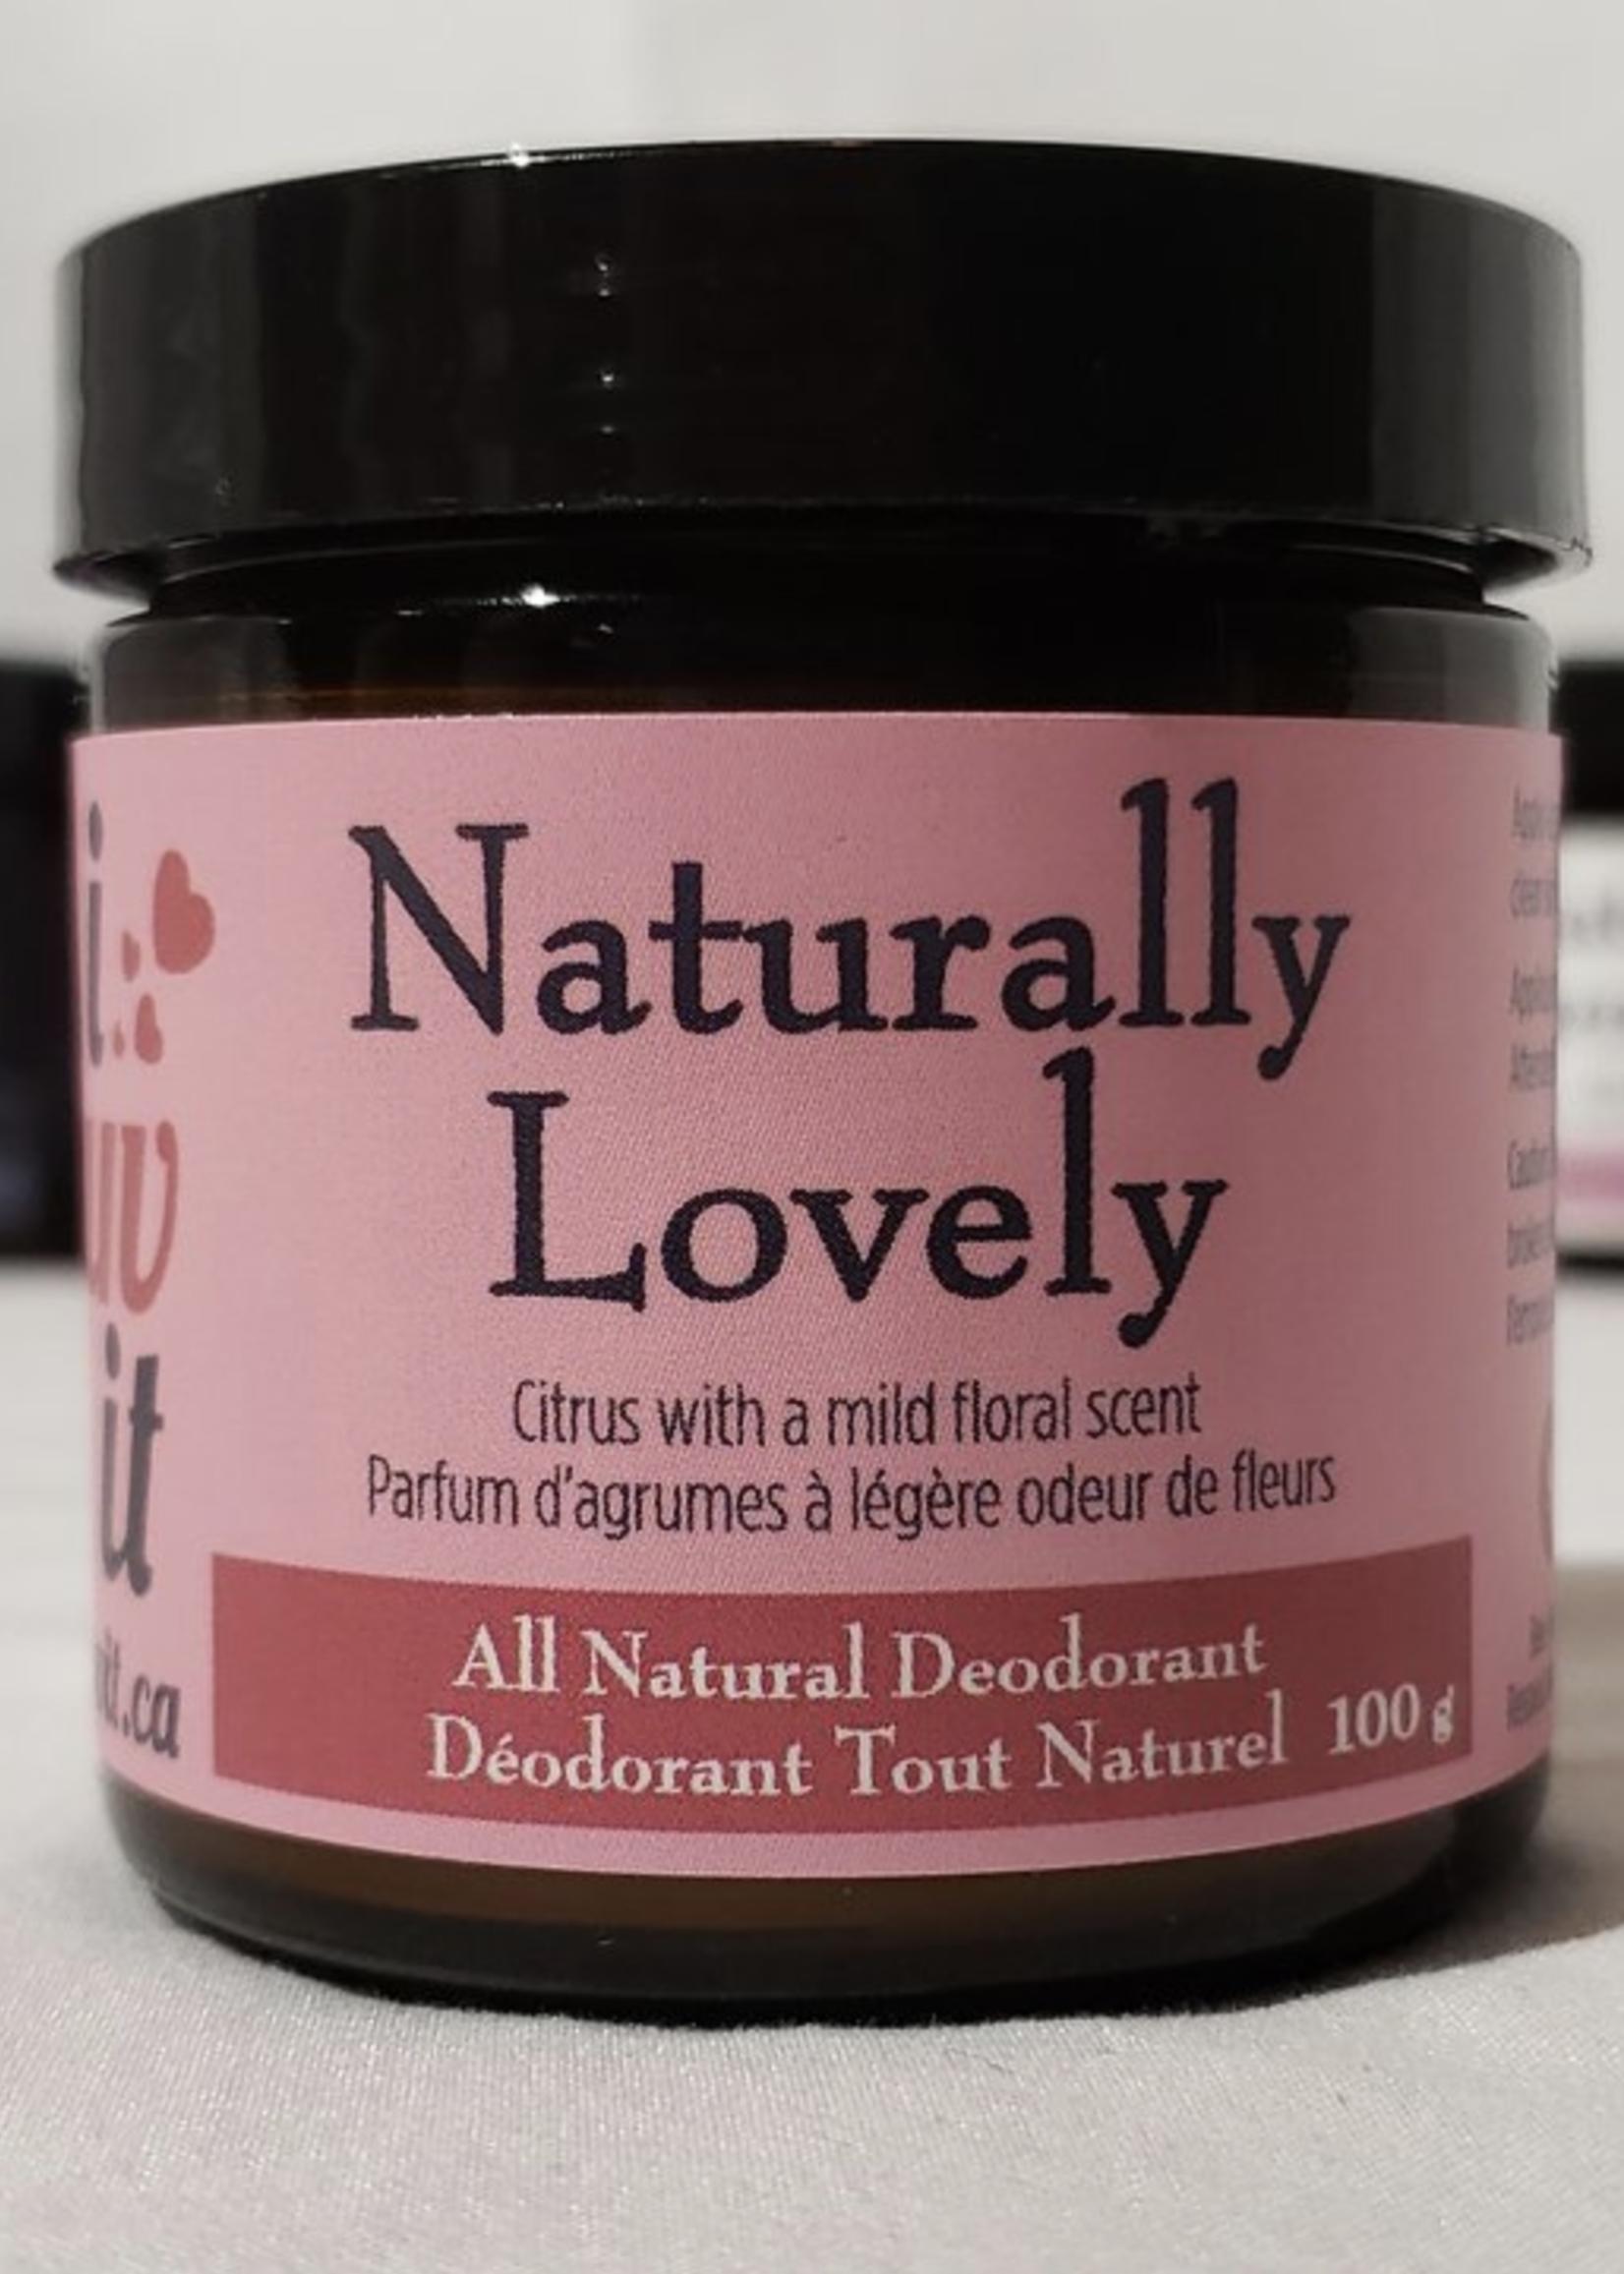 I Luv It Deodorant Naturally Lovely Deodorant